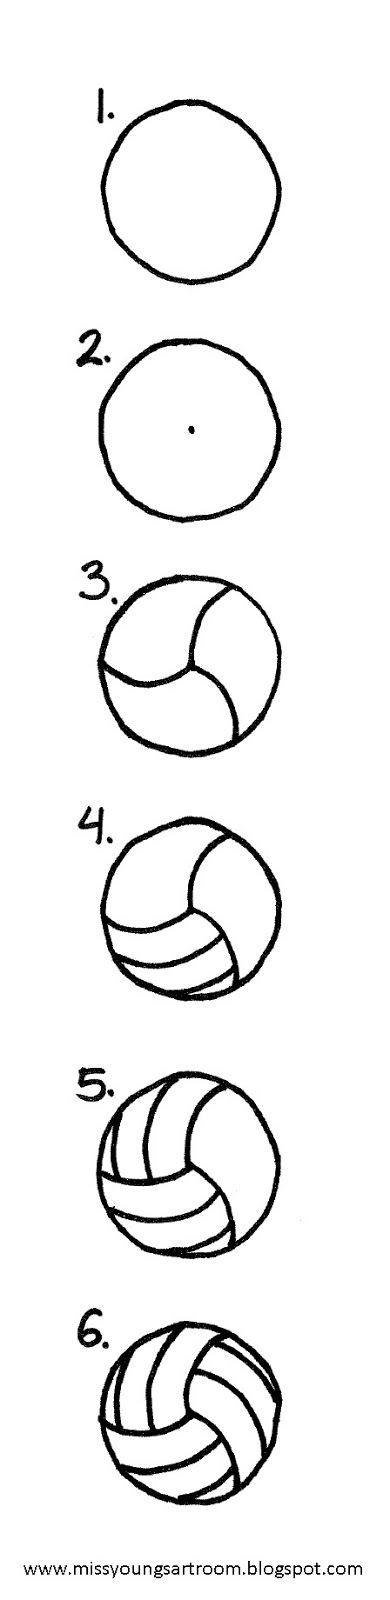 Geschenke geschenke volleyball volleyball geschenke und fussball - Volleyball geschenke ...